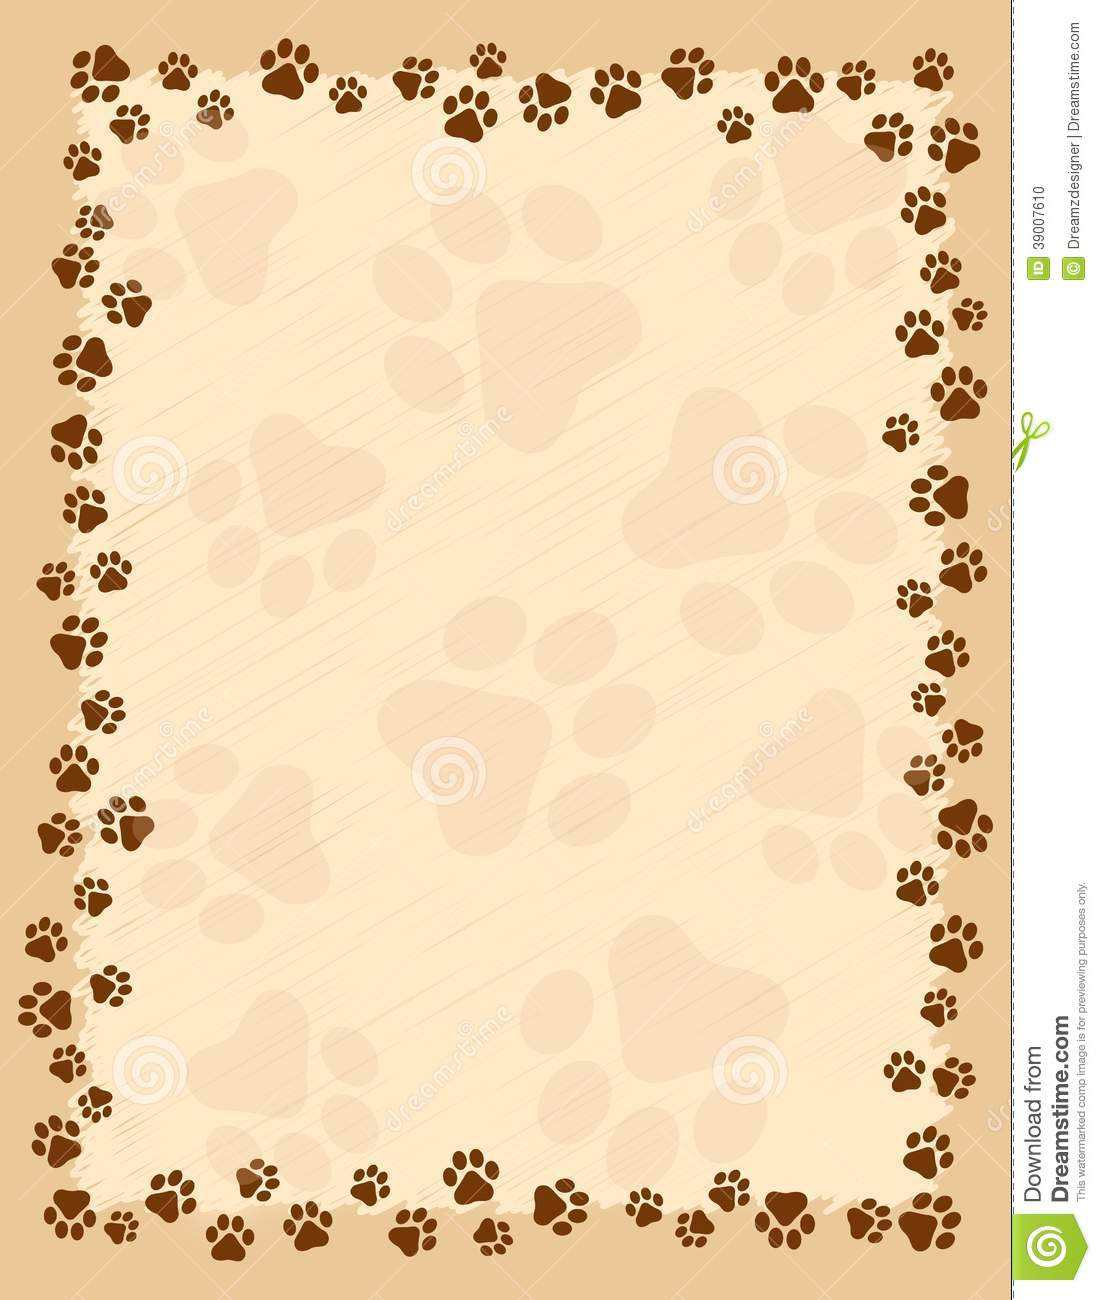 [42+] Paw Print Wallpaper Border On WallpaperSafari